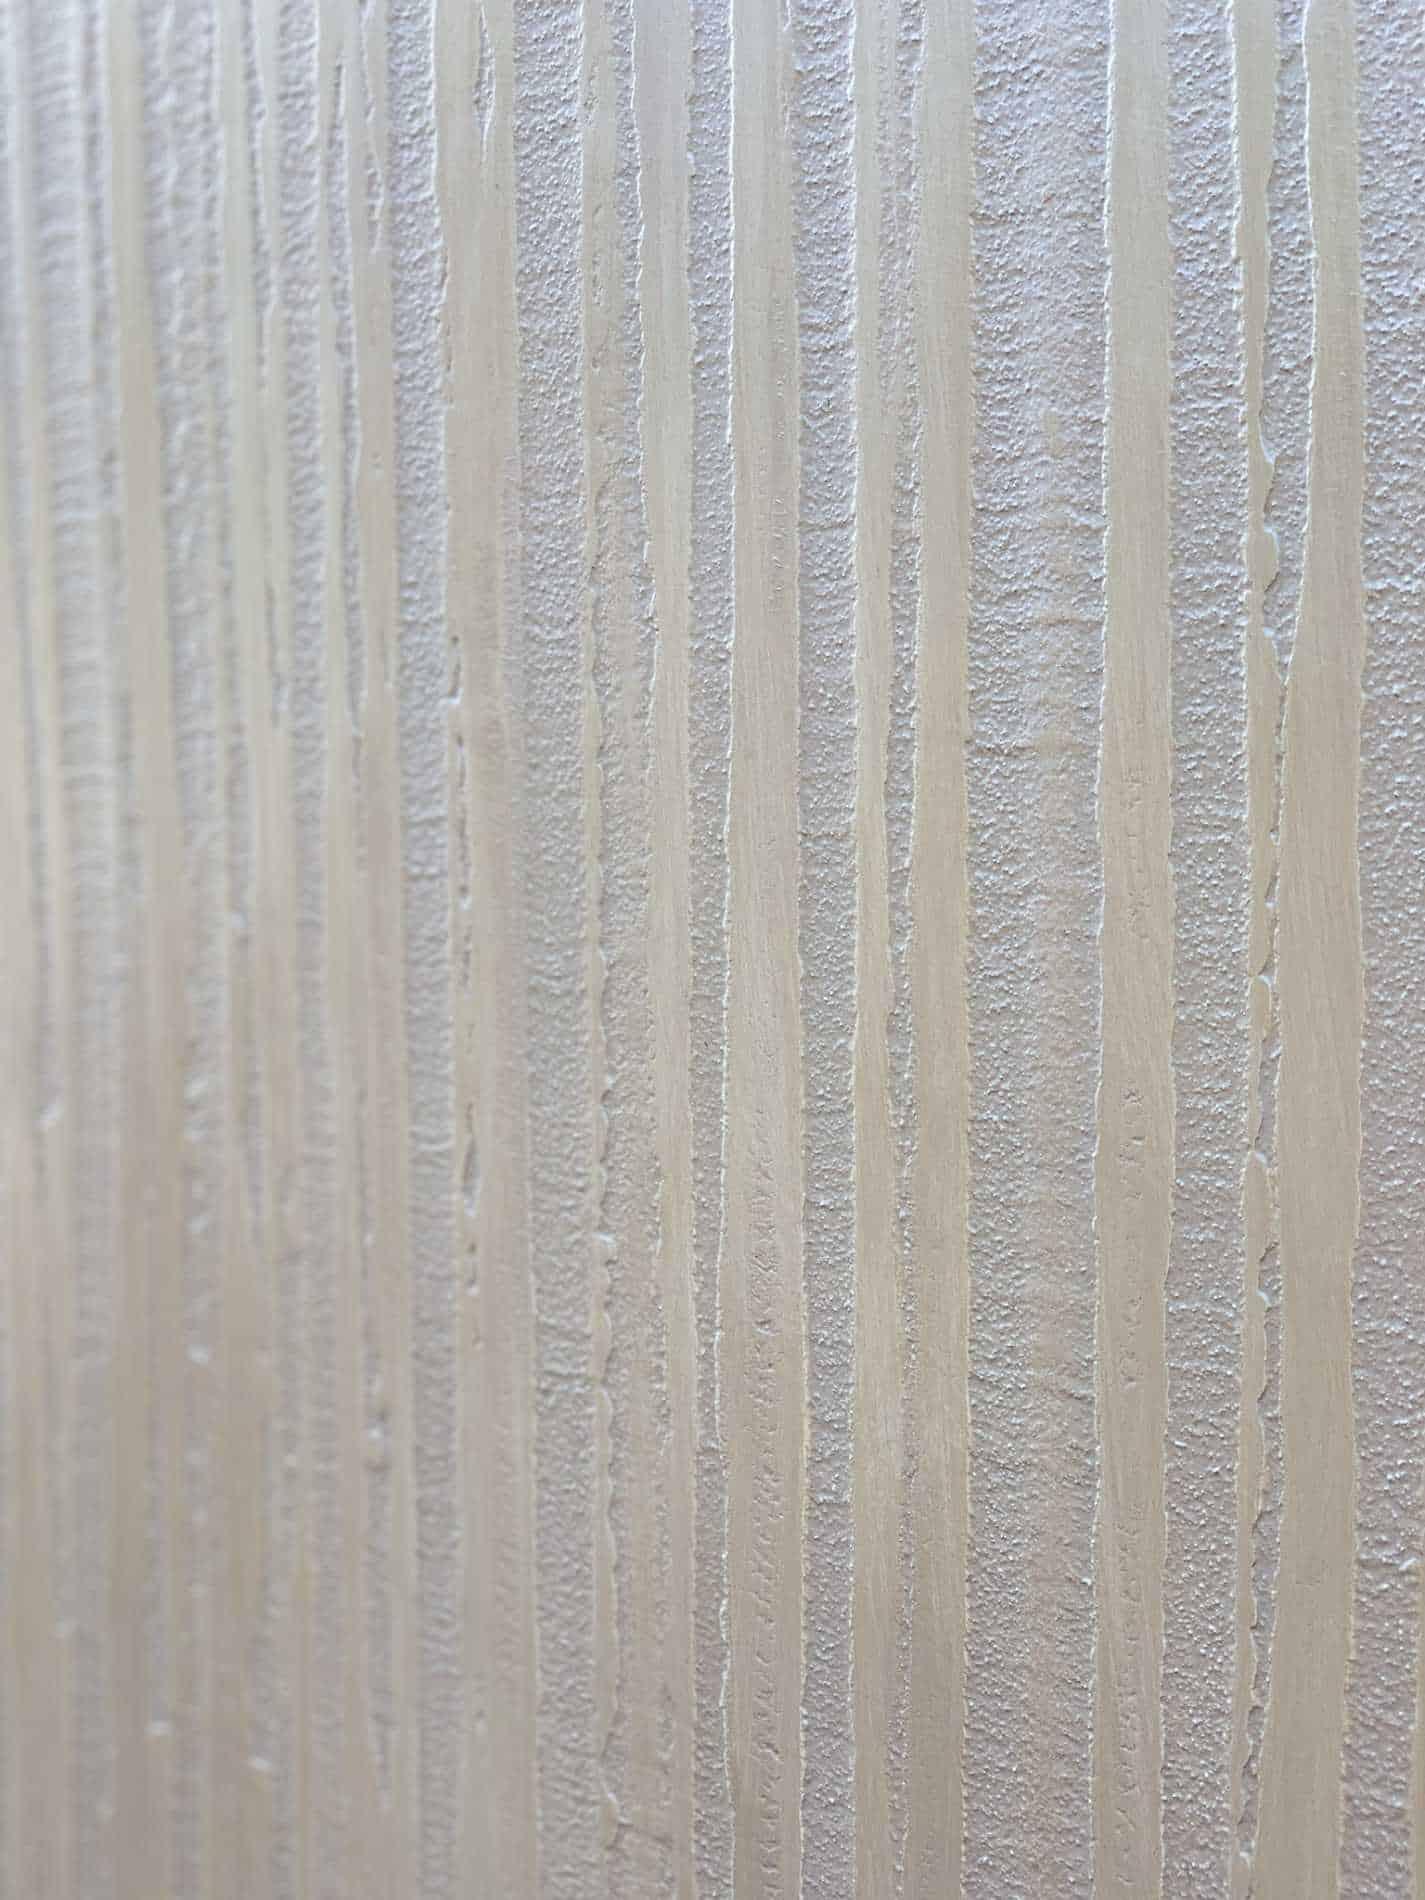 Dekorative Oberfläche Bamboo - Hofele Stuckateur und Maler Süssen